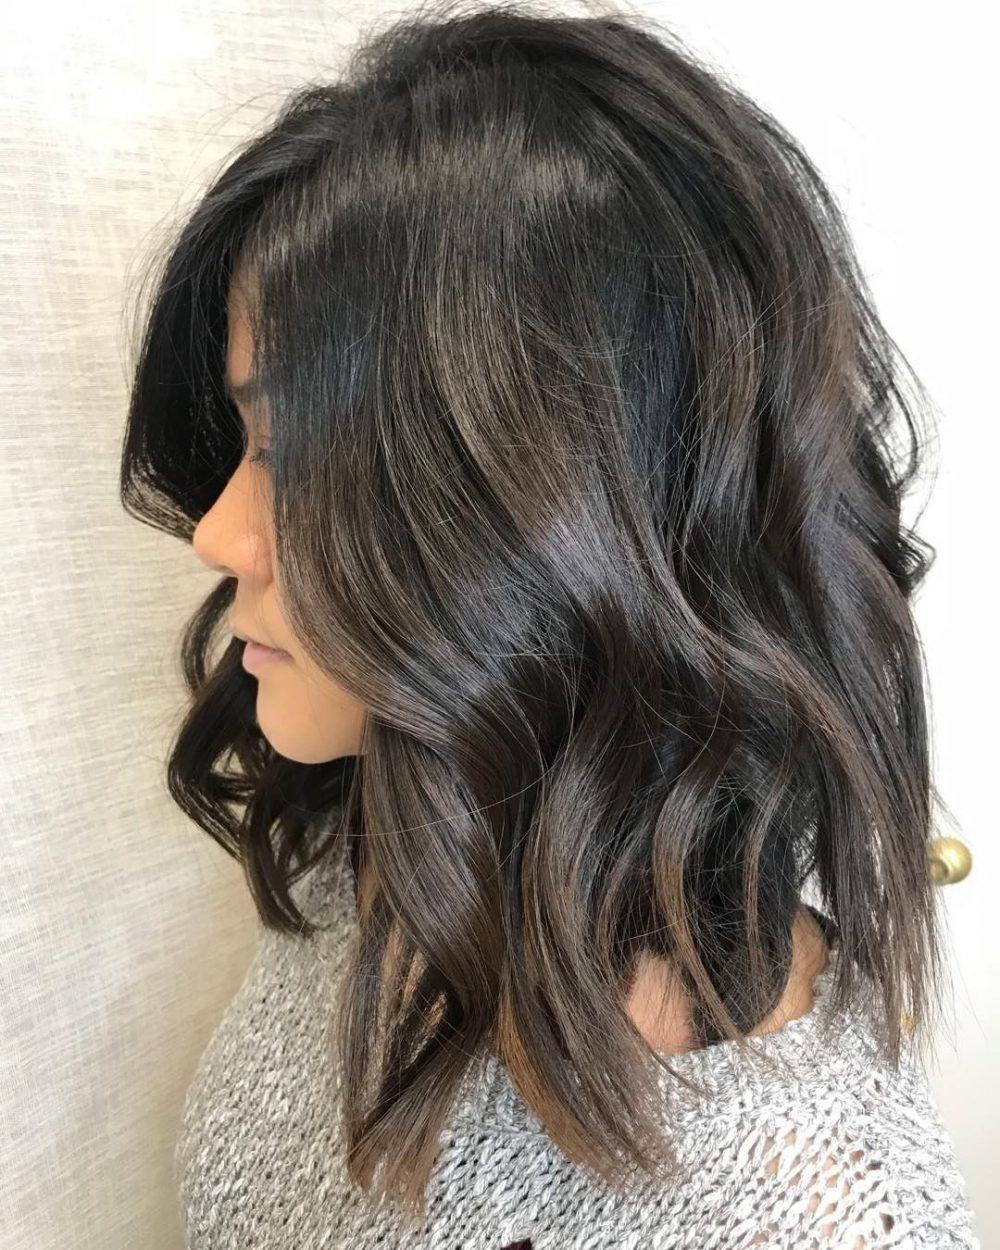 Medium Length Hairstyles For Women 2018 1